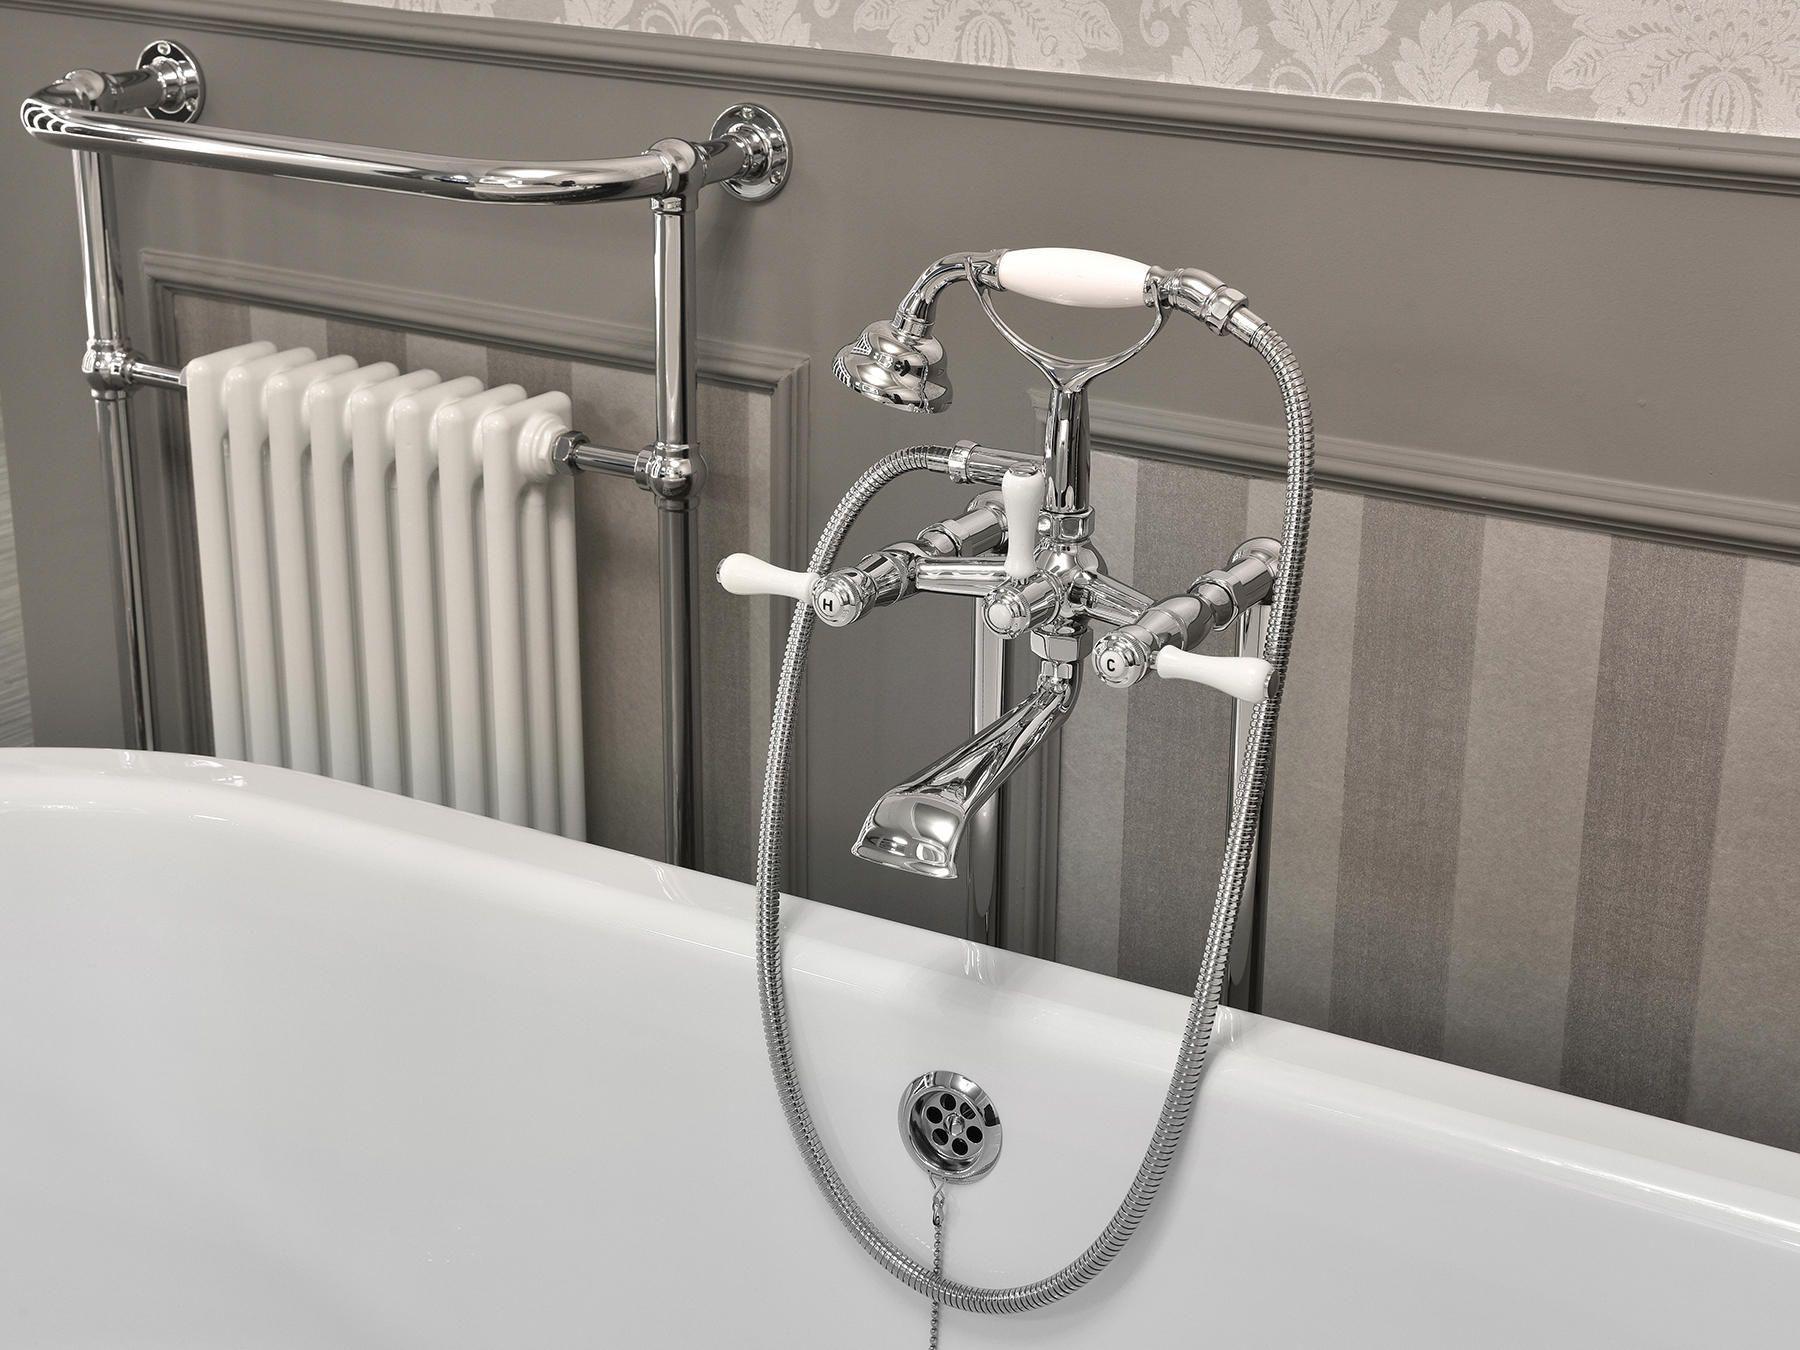 1935 Limoges Bath Shower Mixer Long Spout High Fork Designer Taps